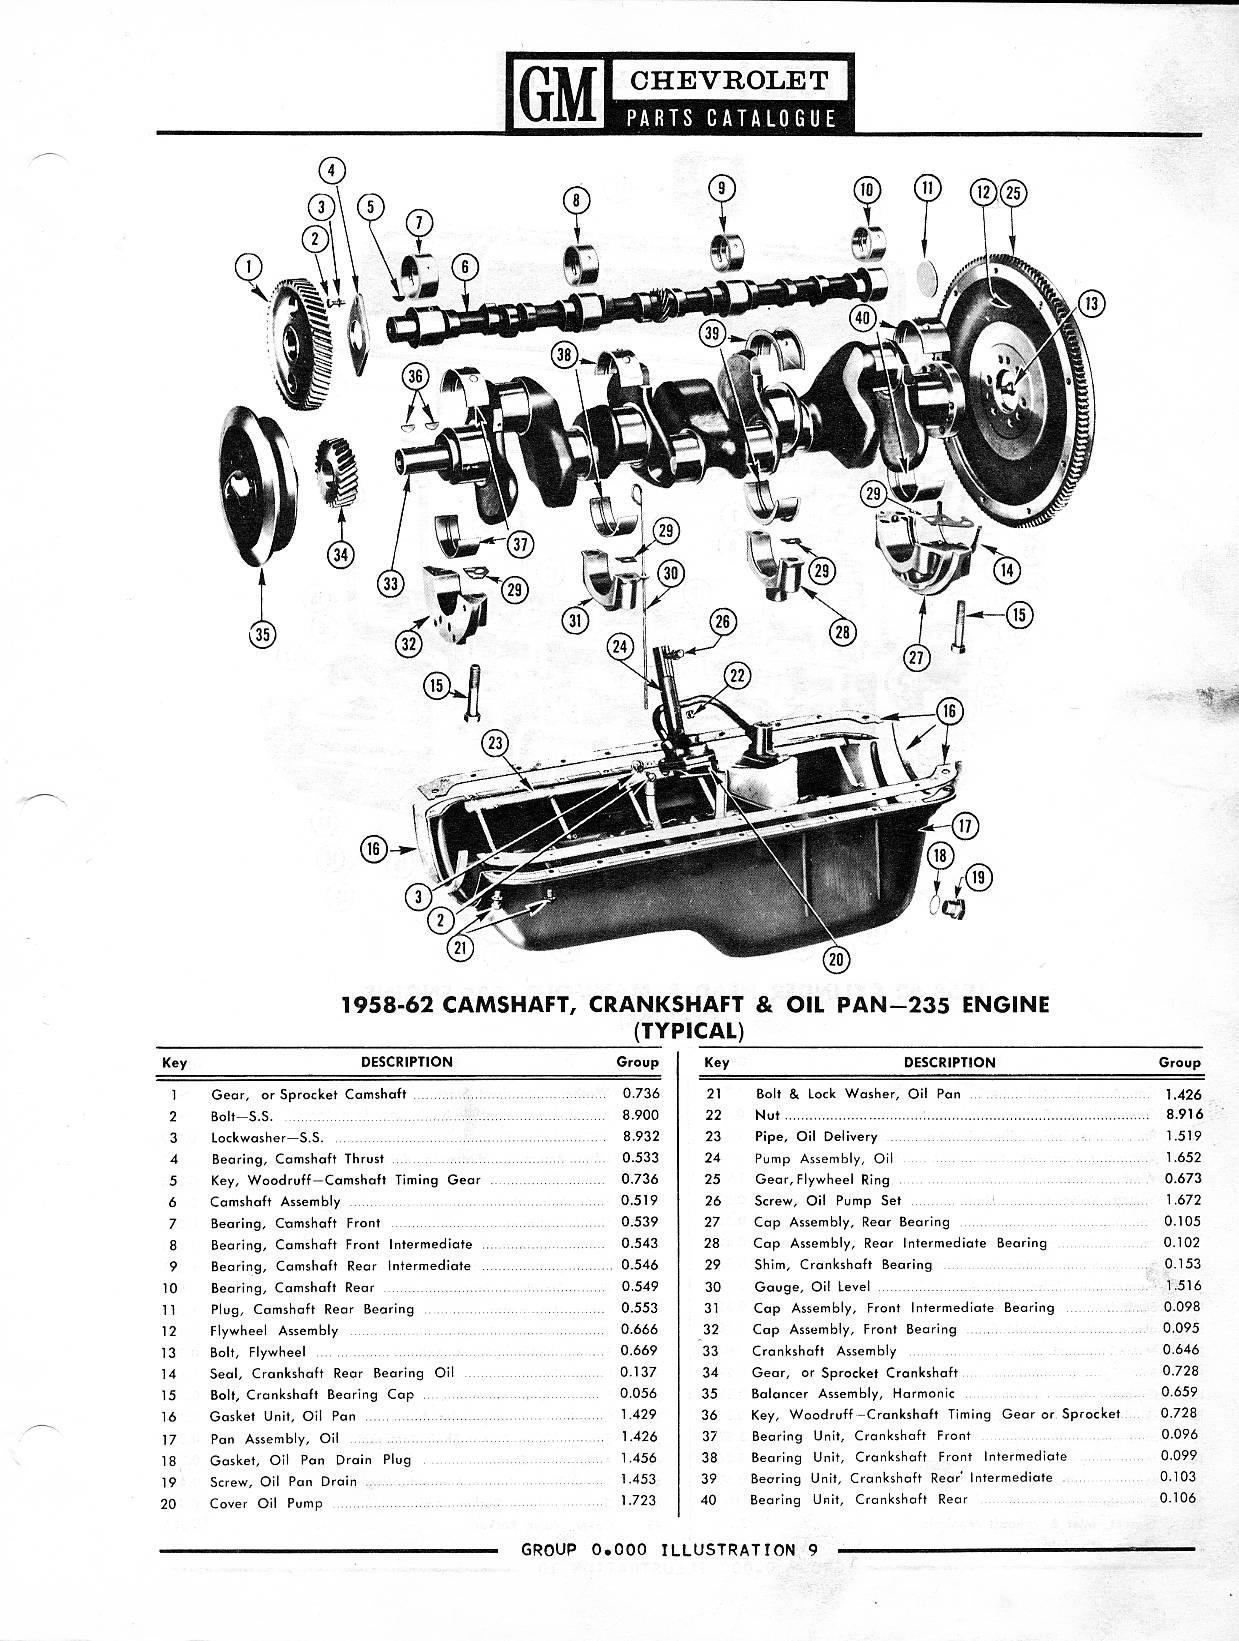 1958-1968 Chevrolet Parts Catalog / Image124.jpg